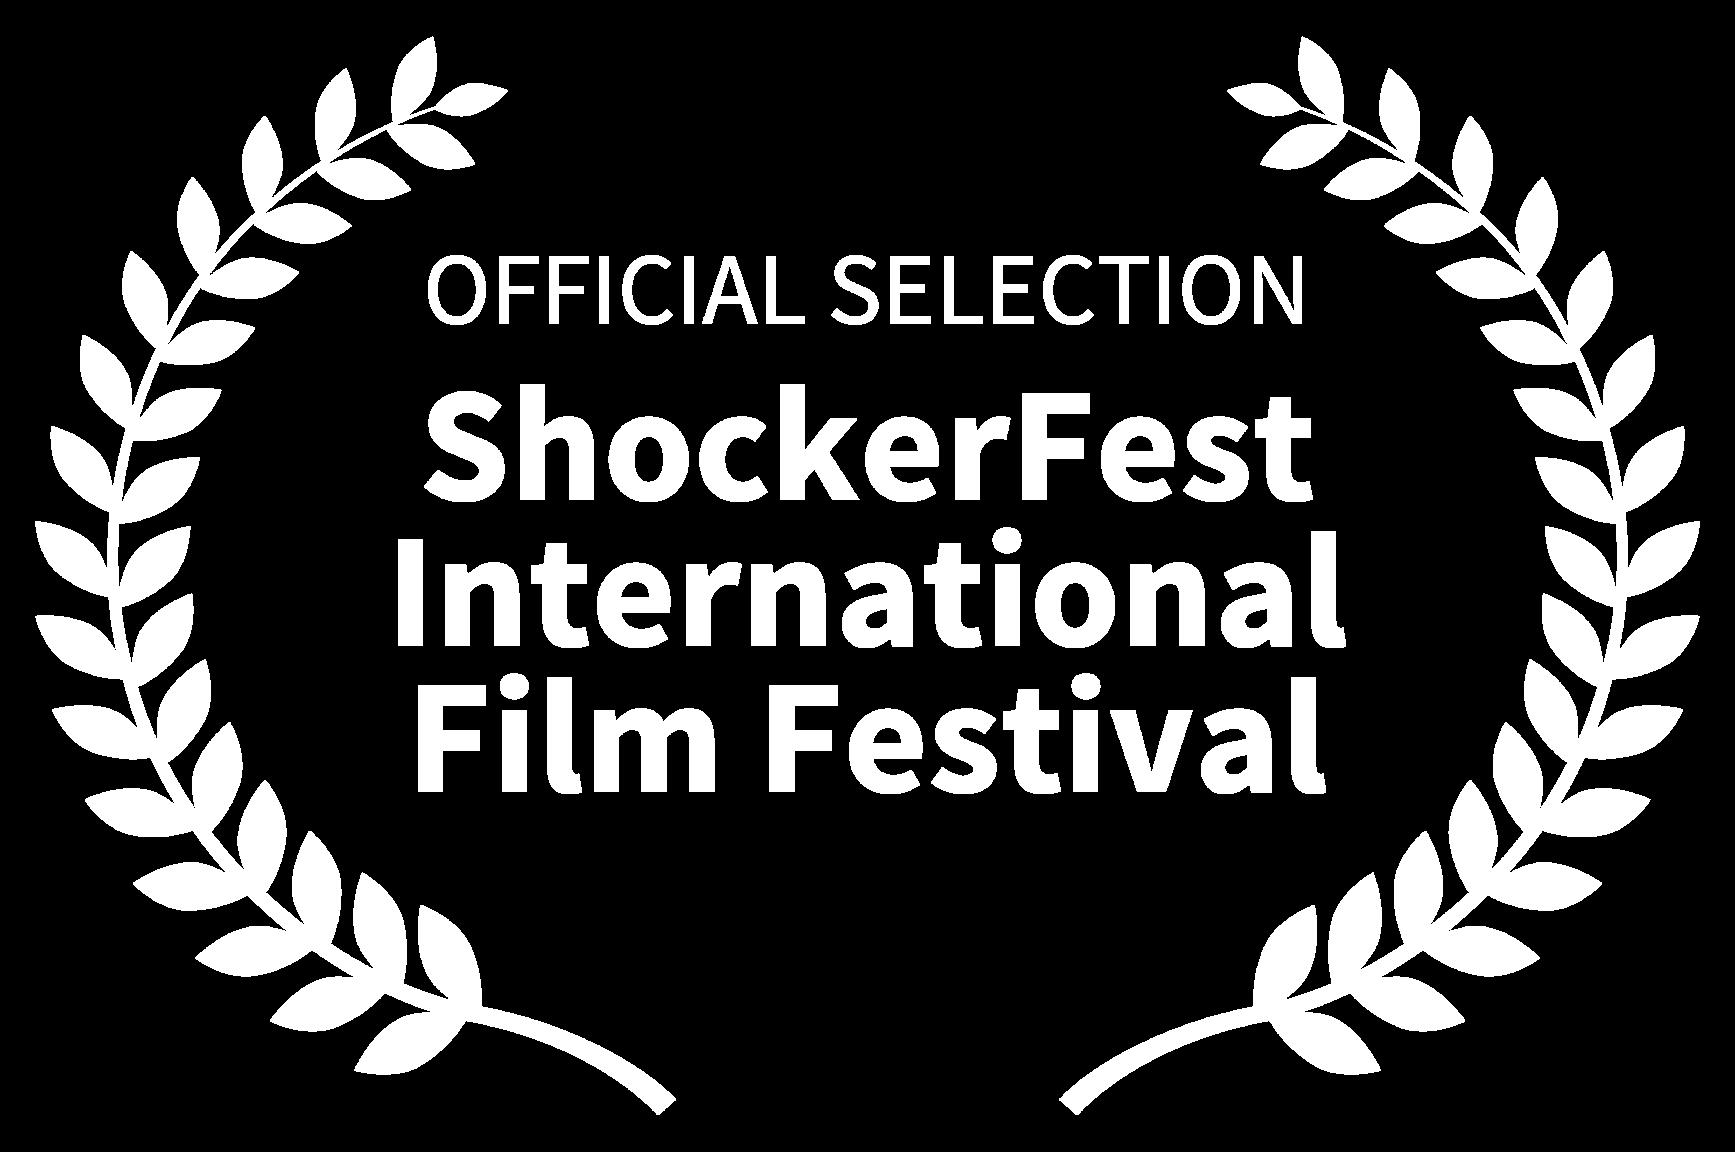 OFFICIAL SELECTION - ShockerFest International Film Festival